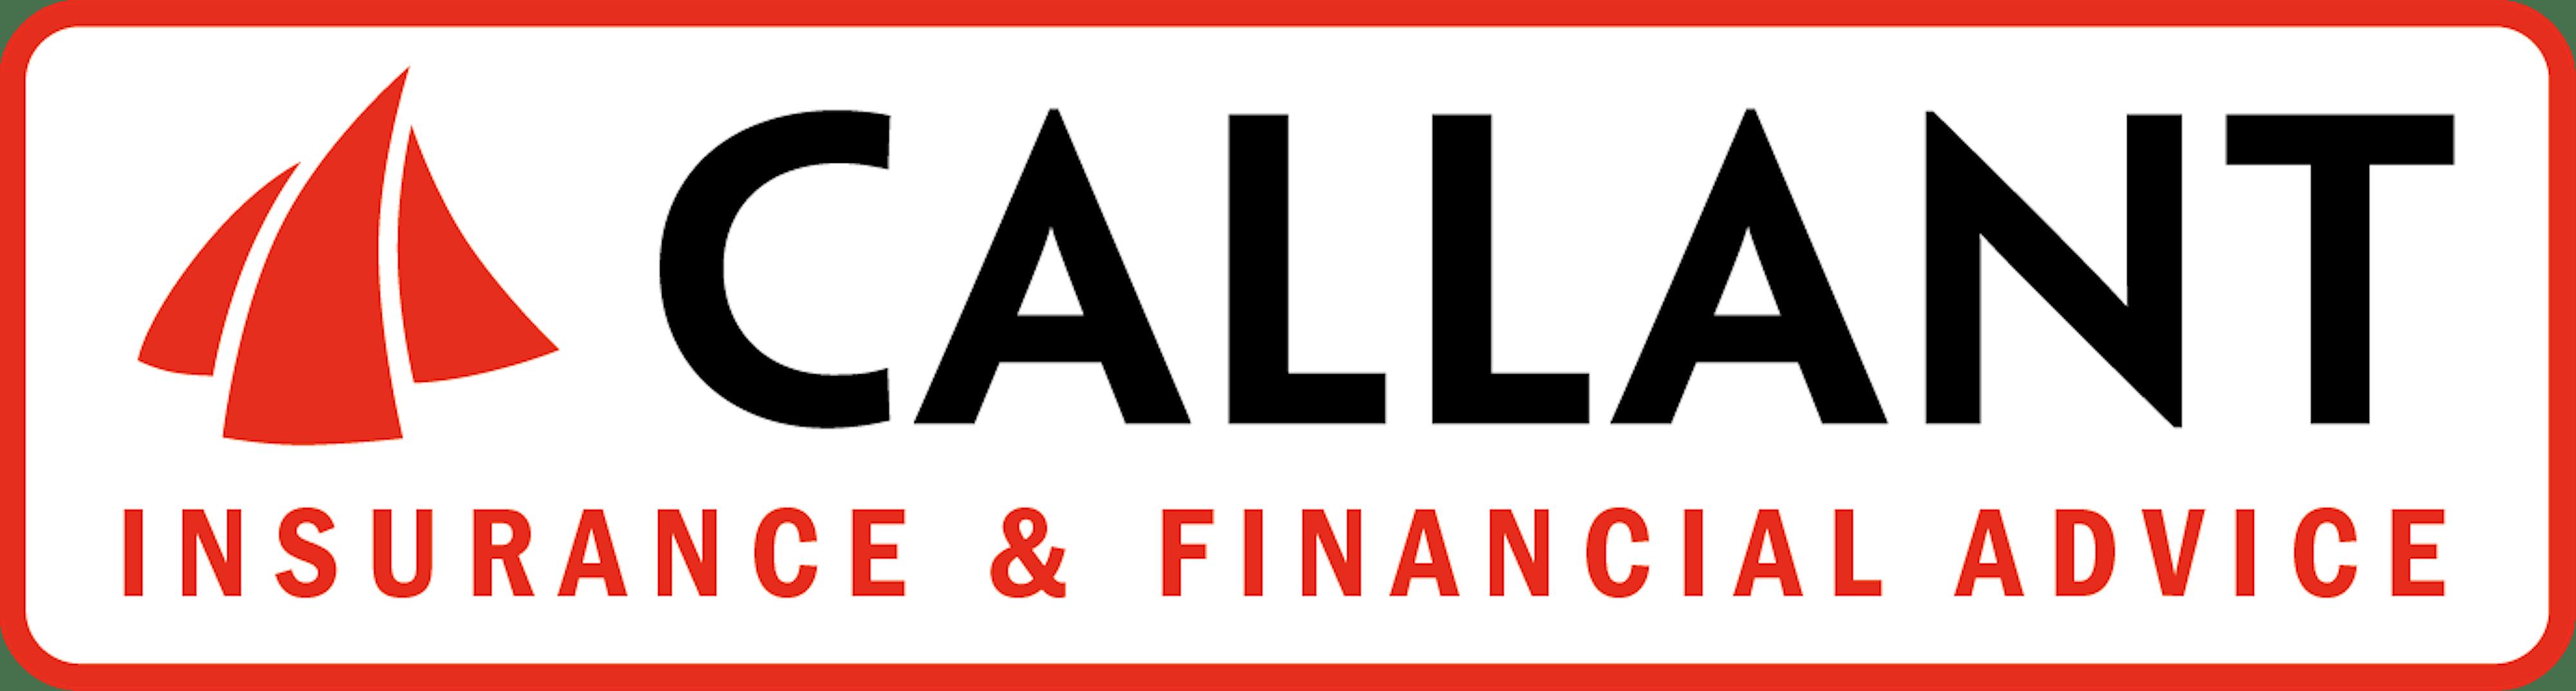 Callant Insurance & Financial Advice logo